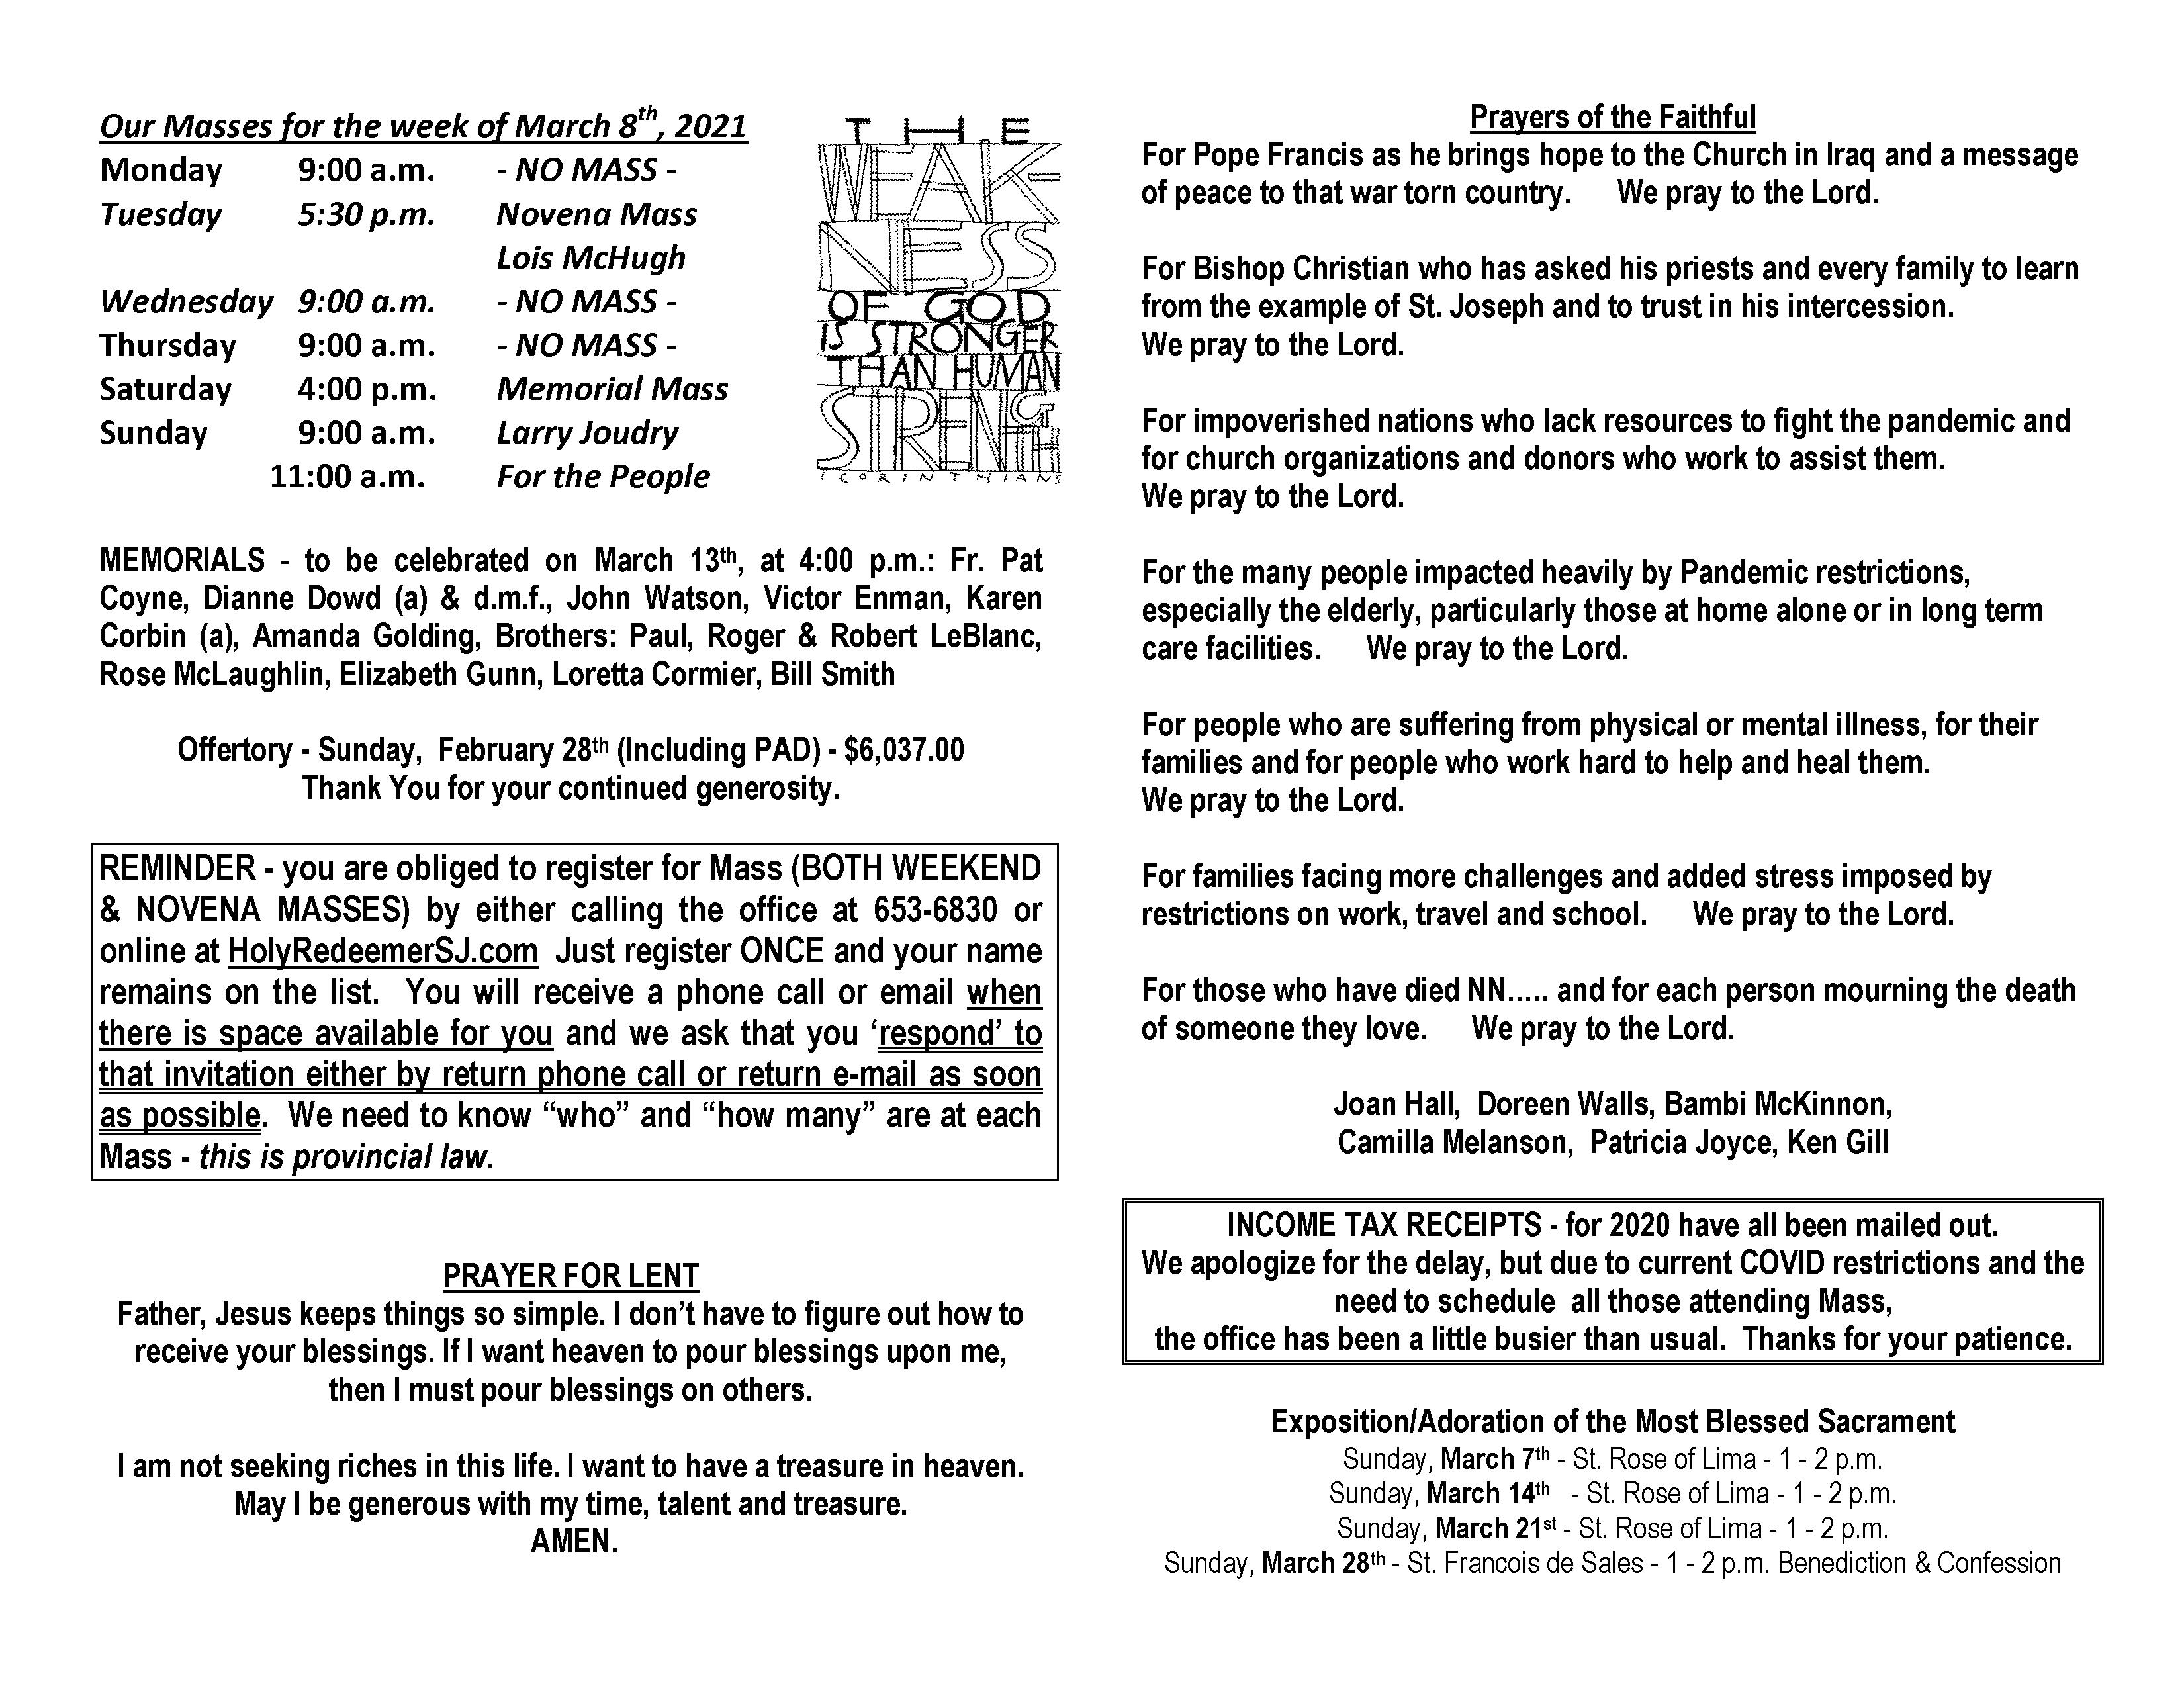 03-07-21